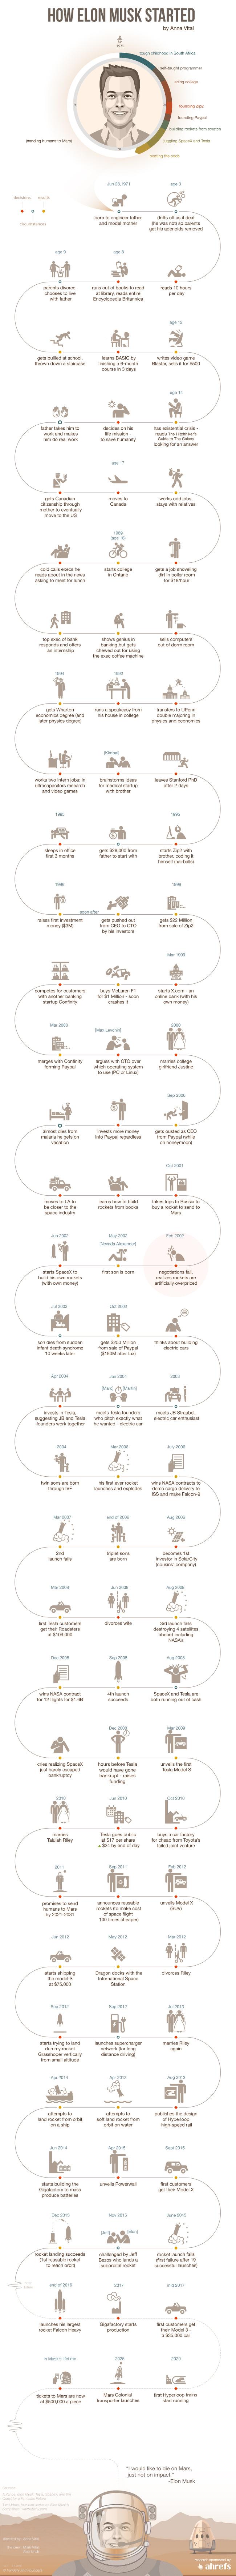 elon musk tesla spacex infographic